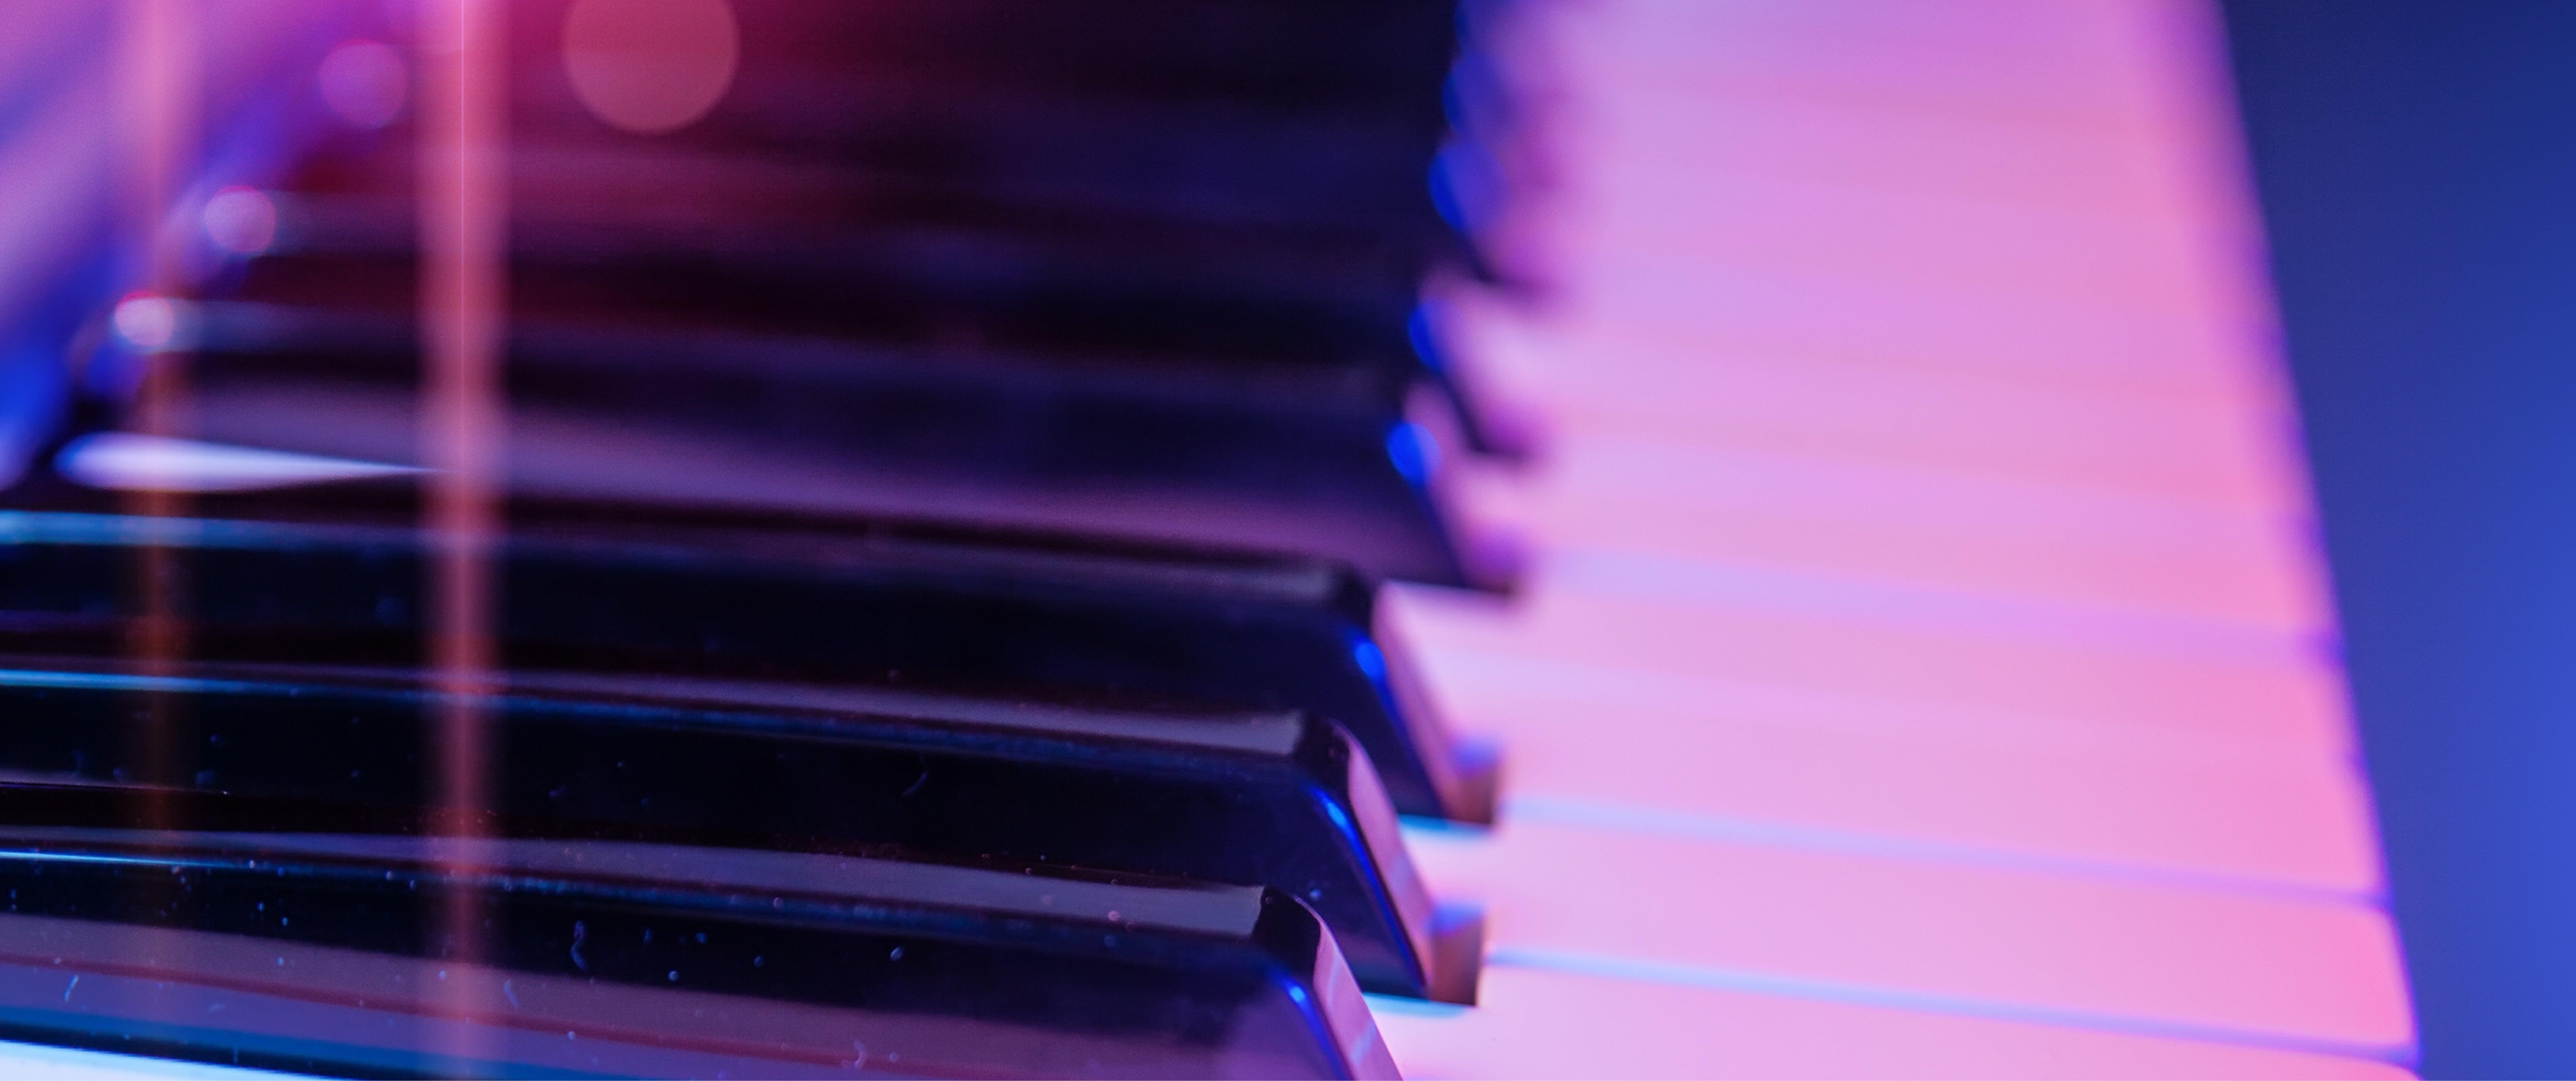 MOSC Masterworks - Beethoven Five